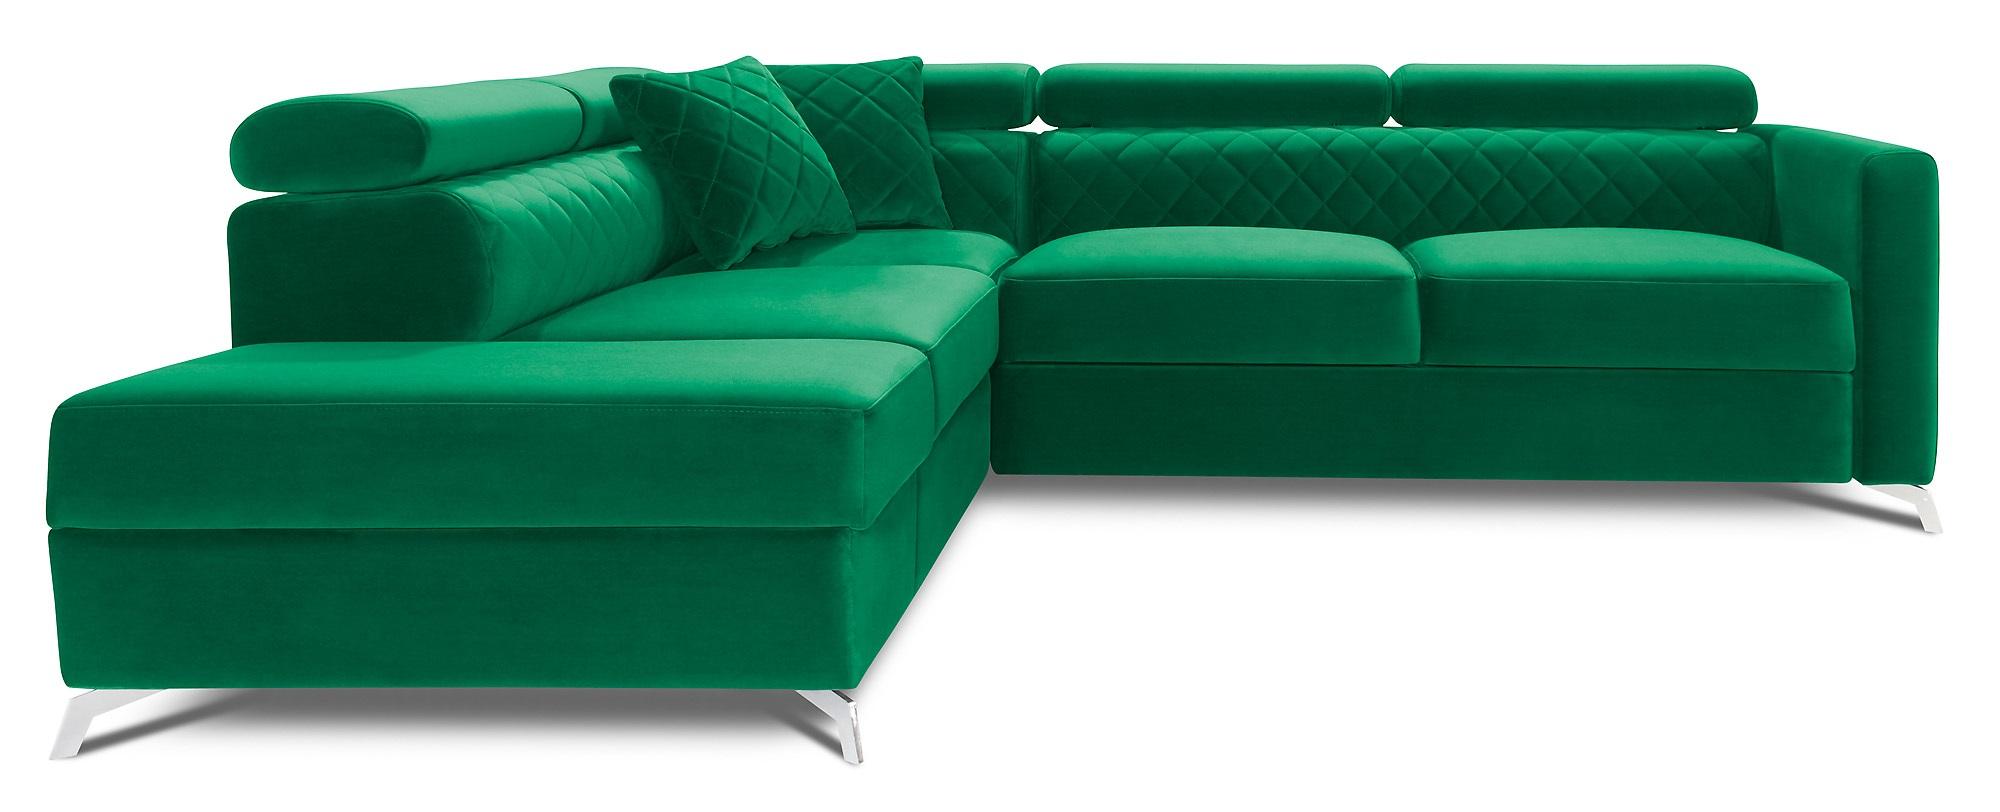 MENTOR komfortowy i funkcjonalny narożnik marki CAYA DESIGN.